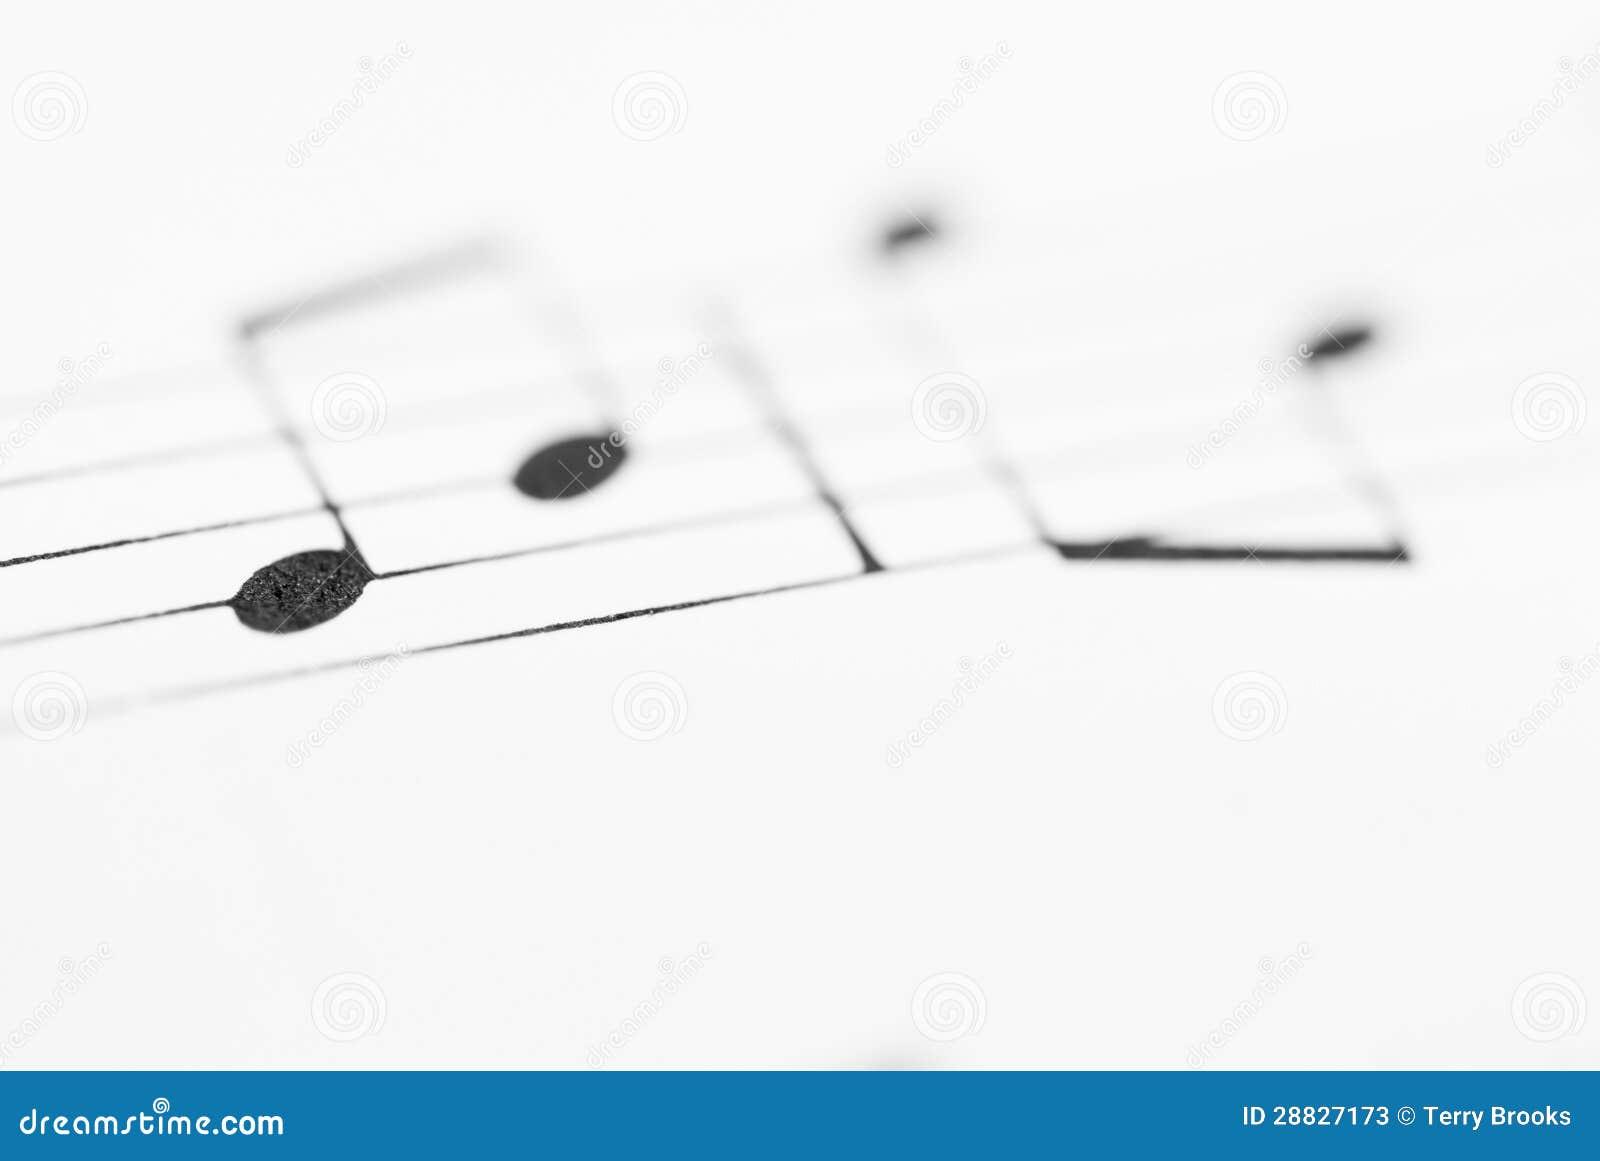 Macro Sheet Music Notes  stock image  Image of minim - 28827173